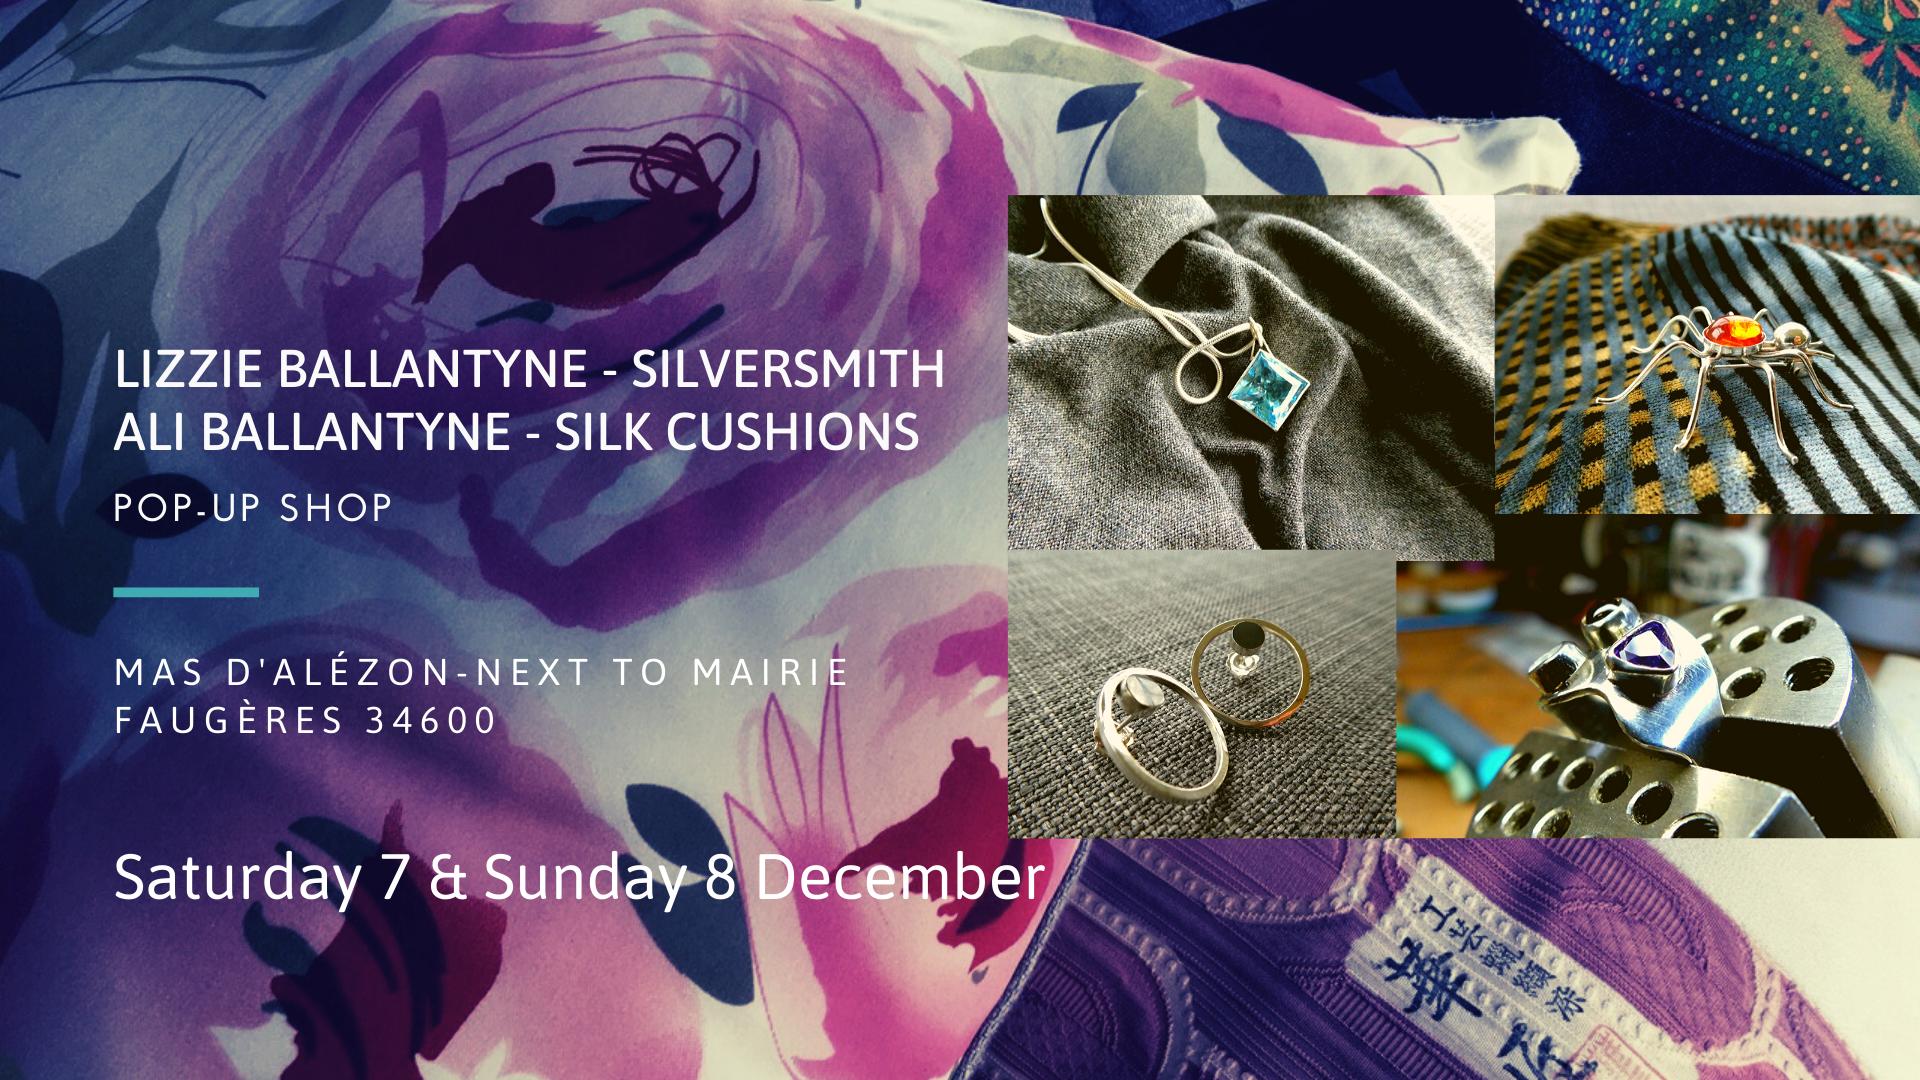 lizzie ballantyne silversmith + ali ballantyne cushions.png